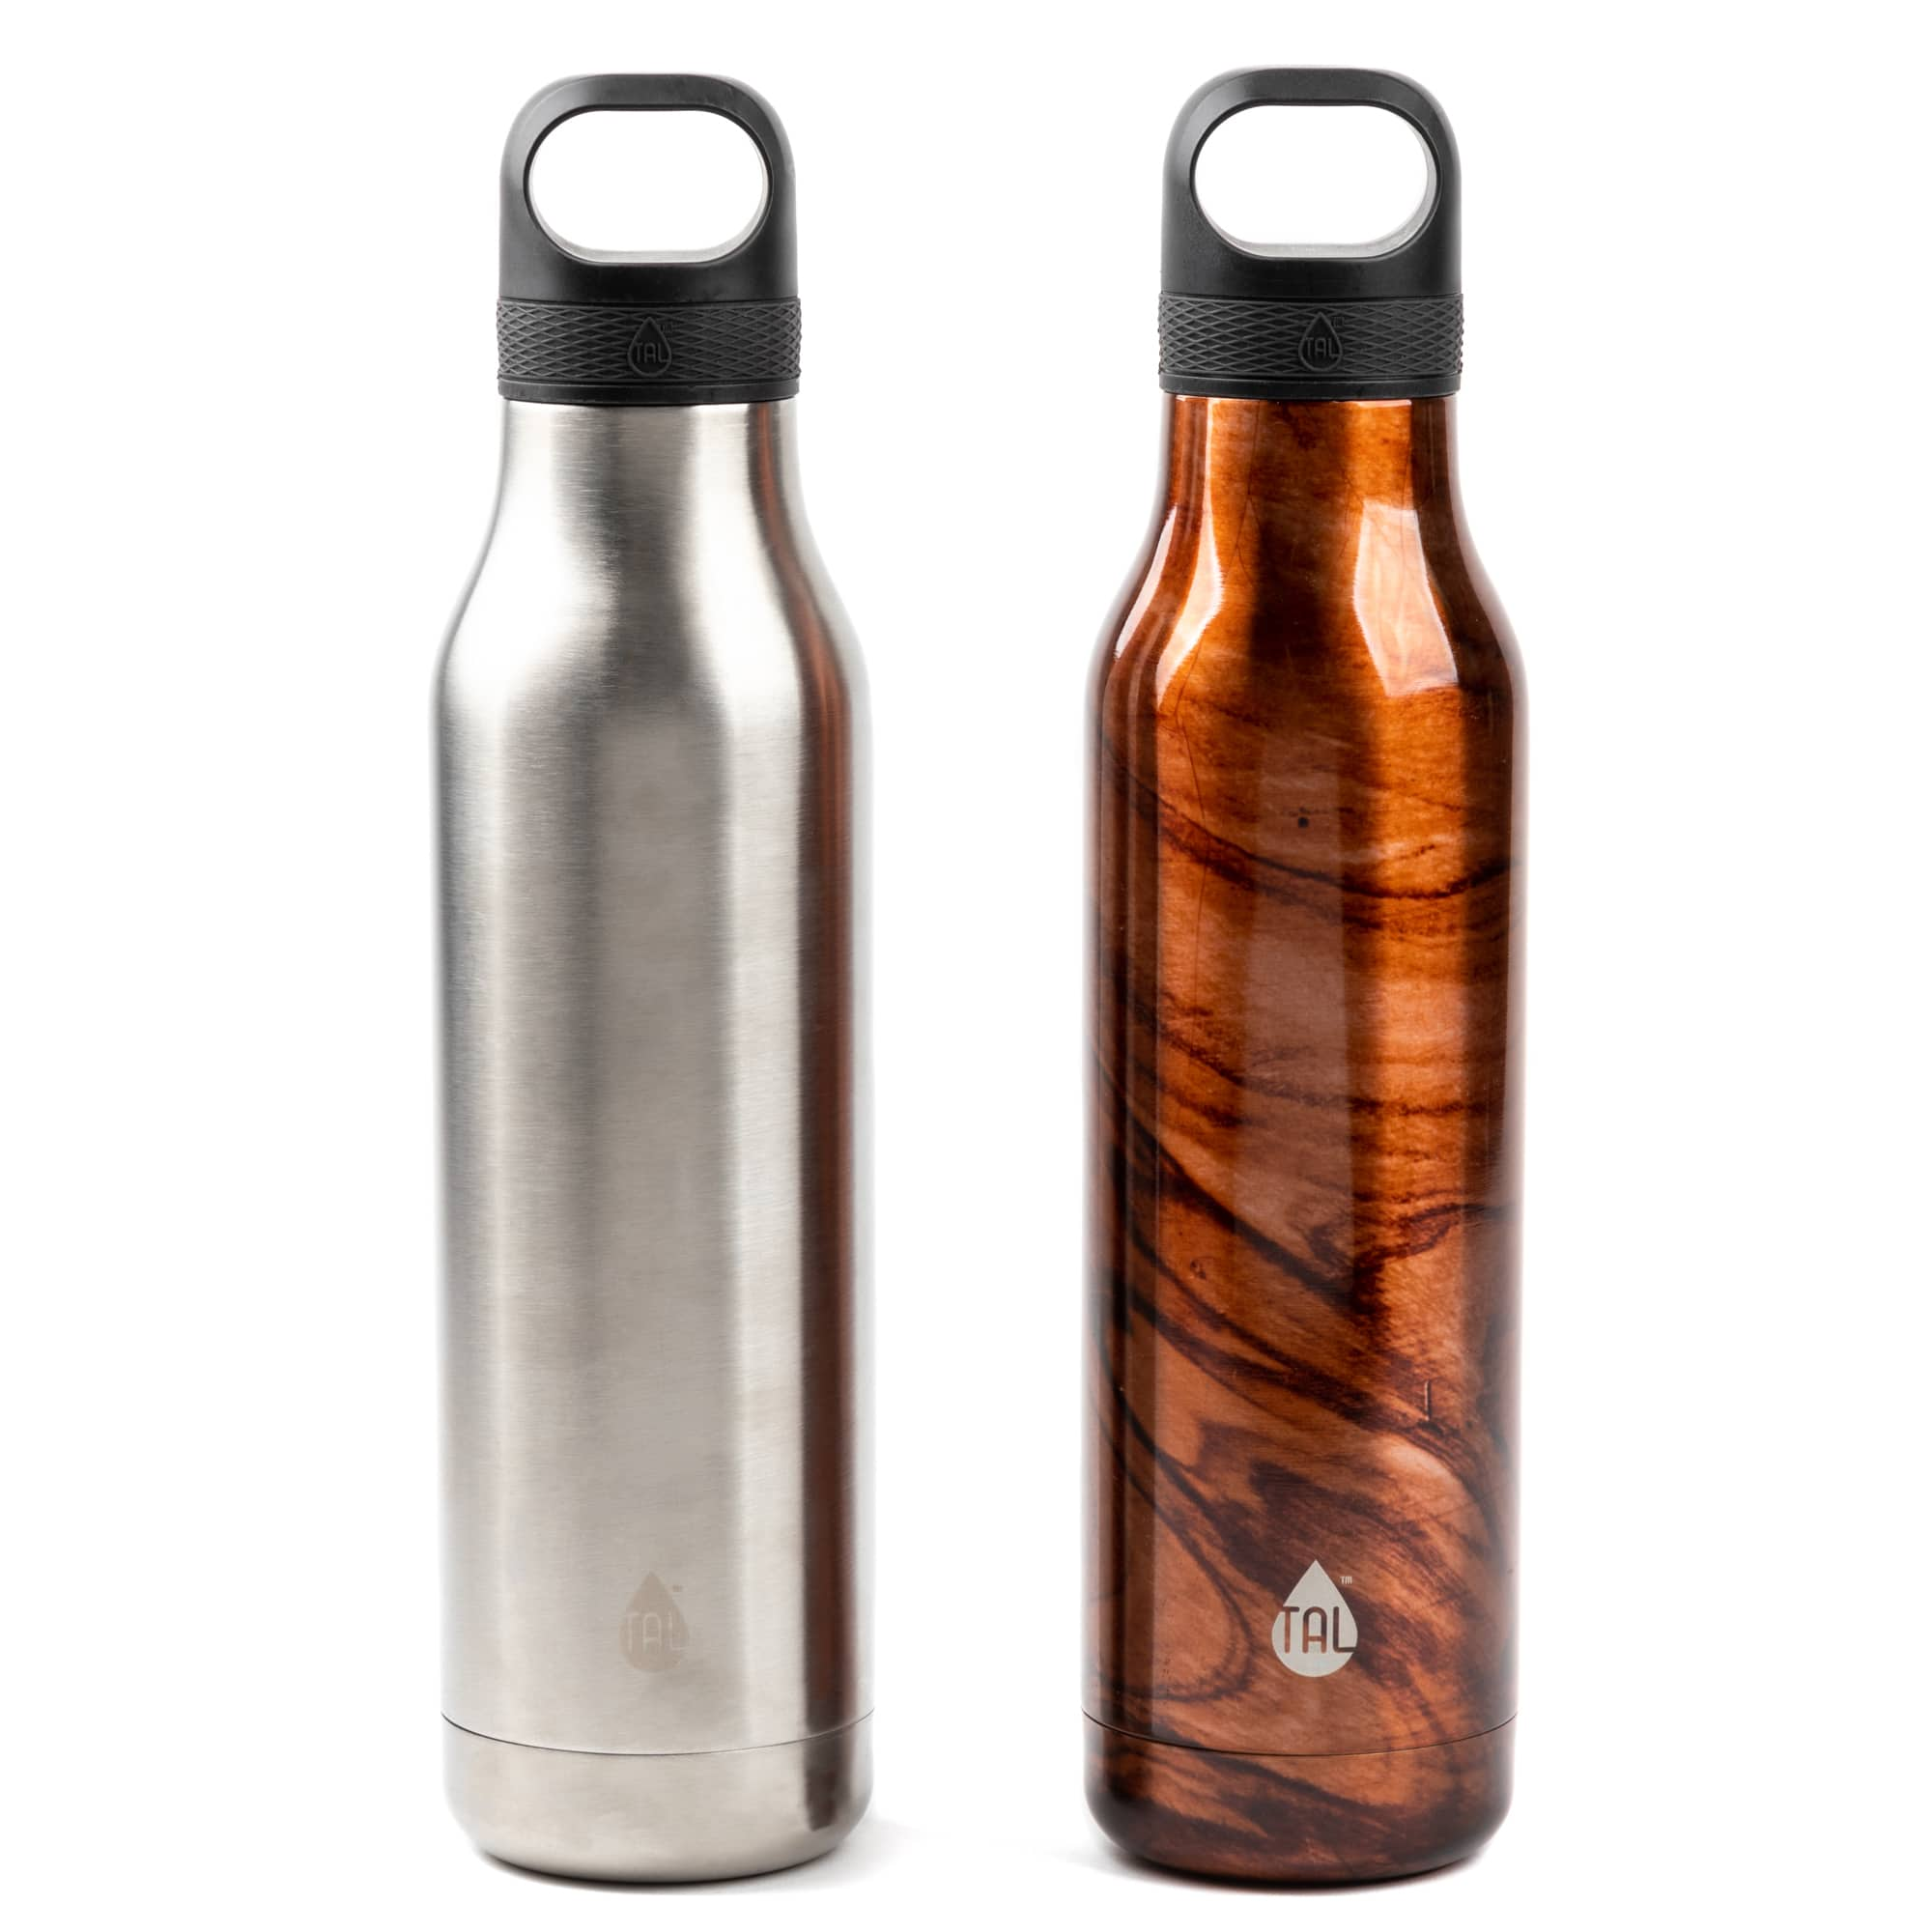 2-Pack TAL 24-oz Ranger Sport Stainless Steel Water Bottles $12.97 at Walmart